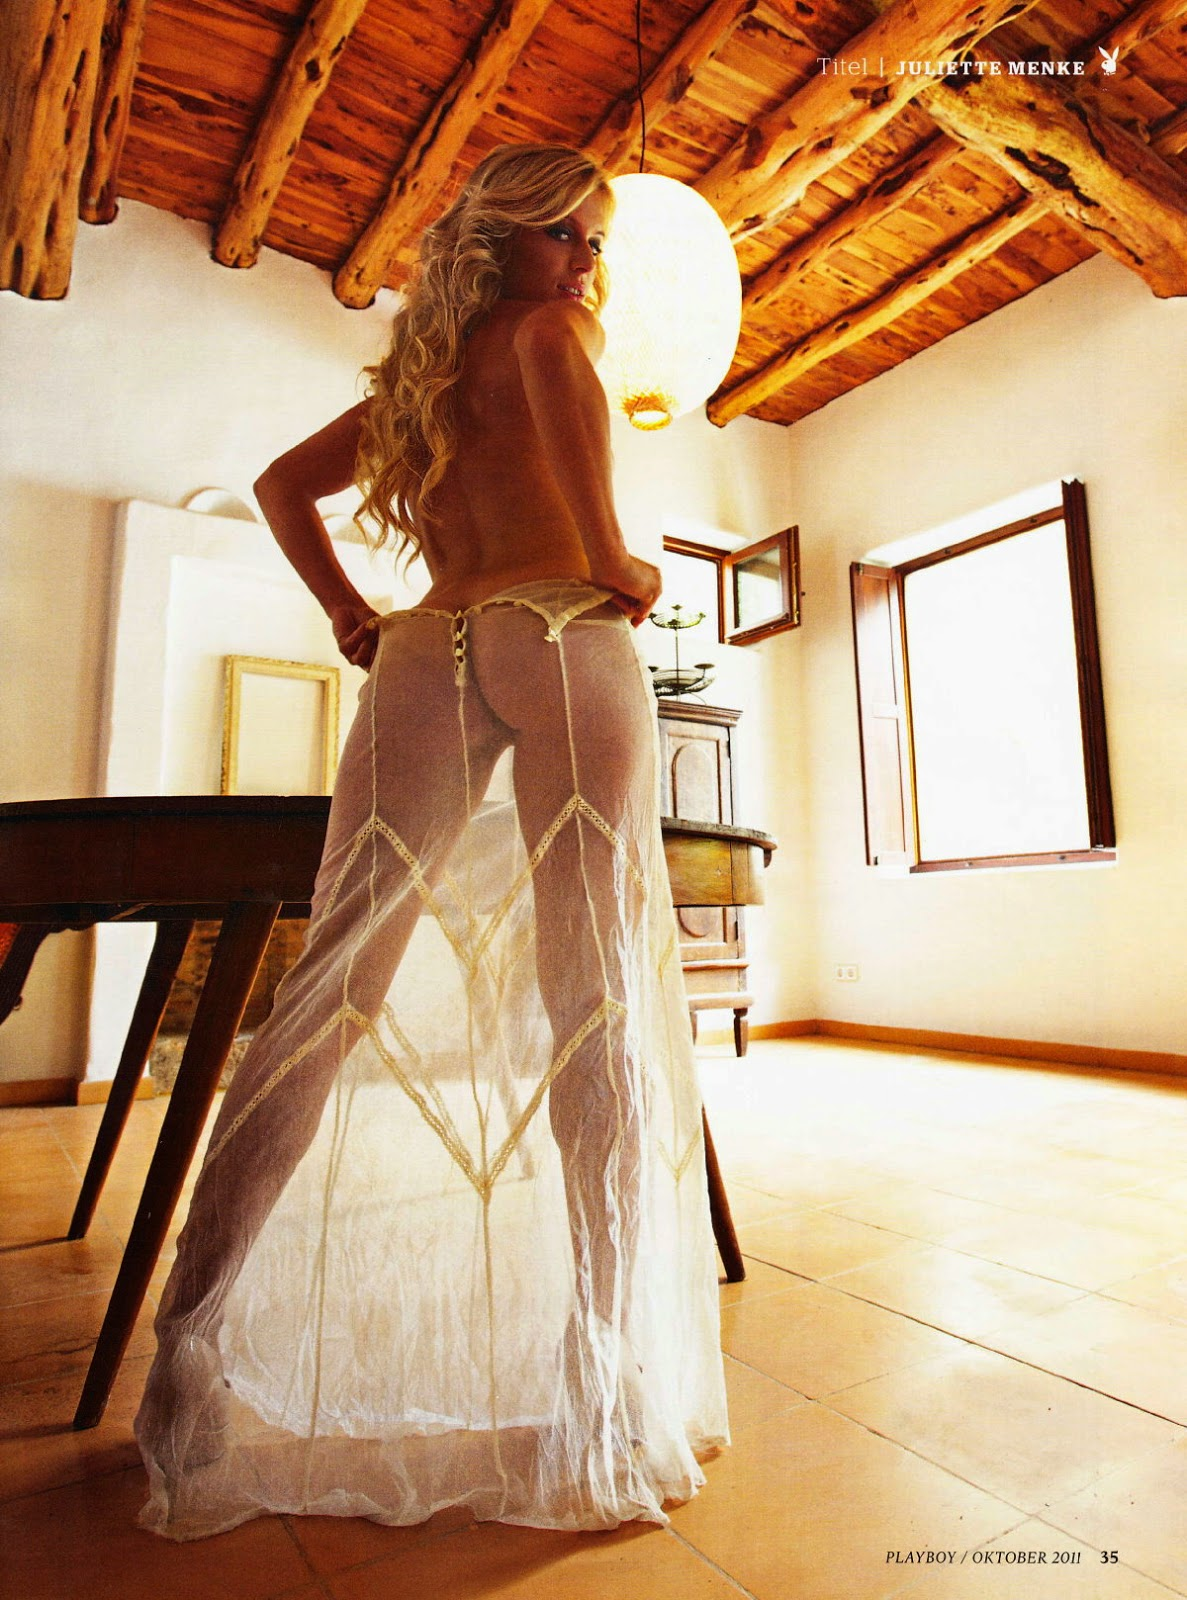 Juliette Menke - German Soap Star Naked in Playboy! (24 pics)